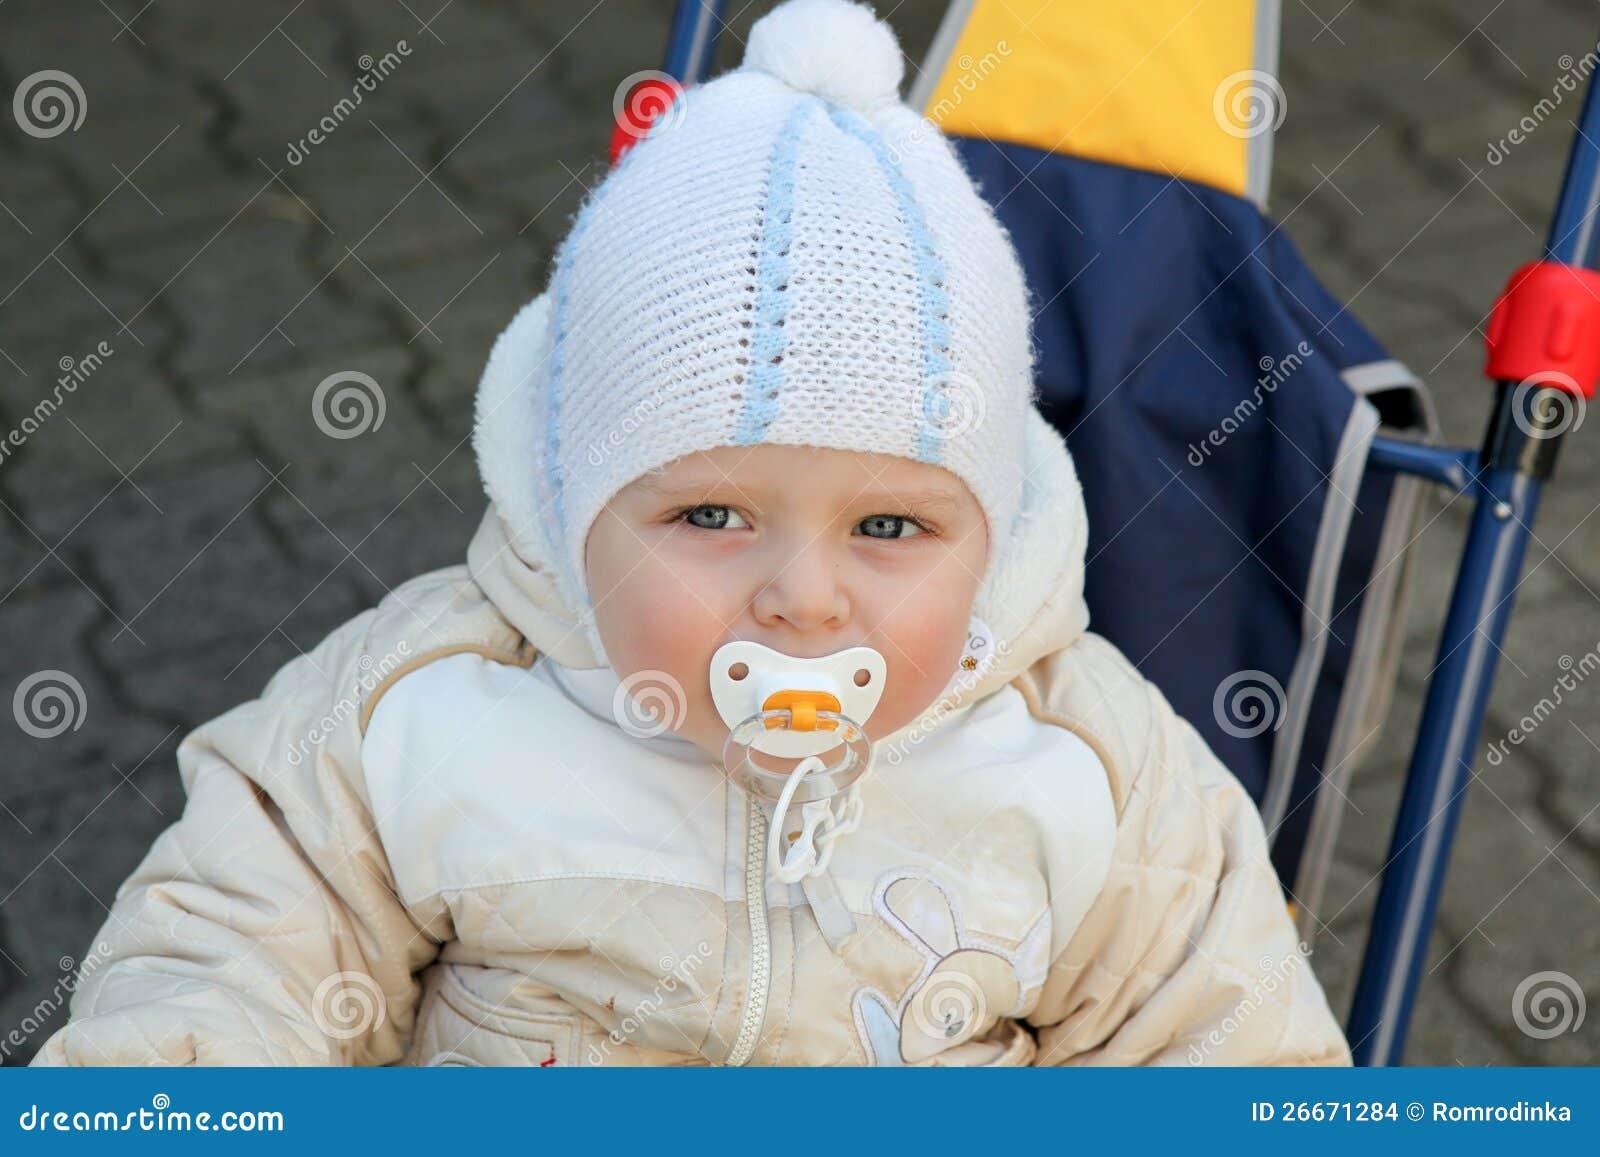 Baby Clothes Boy